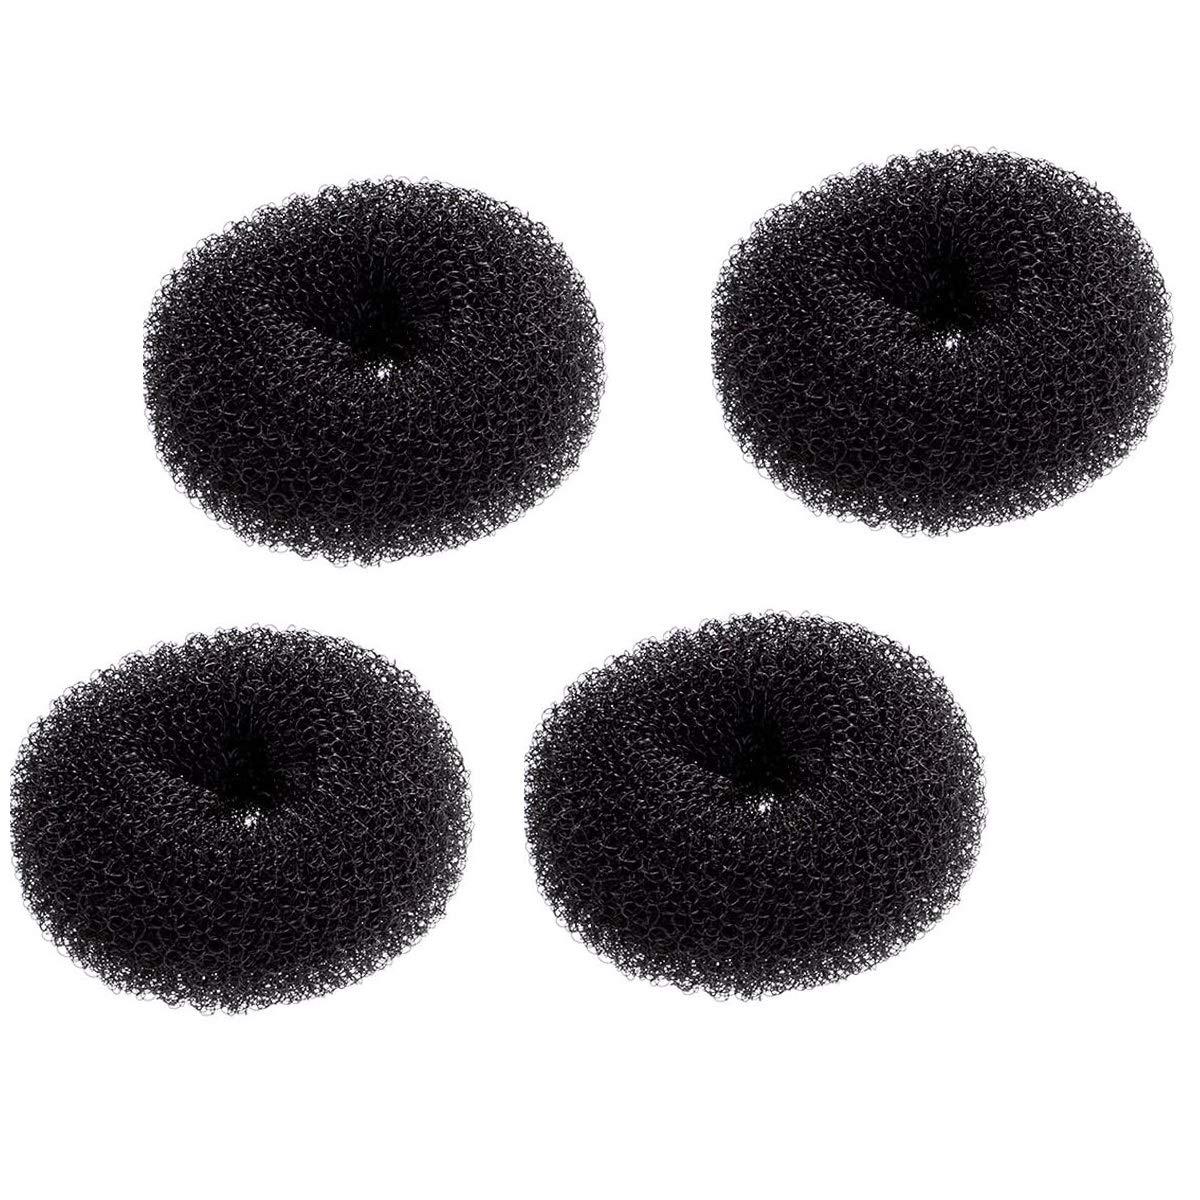 4 Pack Extra Small Hair Bun Maker Mini Chignon Hair Doughnut Shaper Hair Donut Sock Bun Form for Kids, Girls, Short and Thin Hair (Small Size 2.4 Inch, Black)